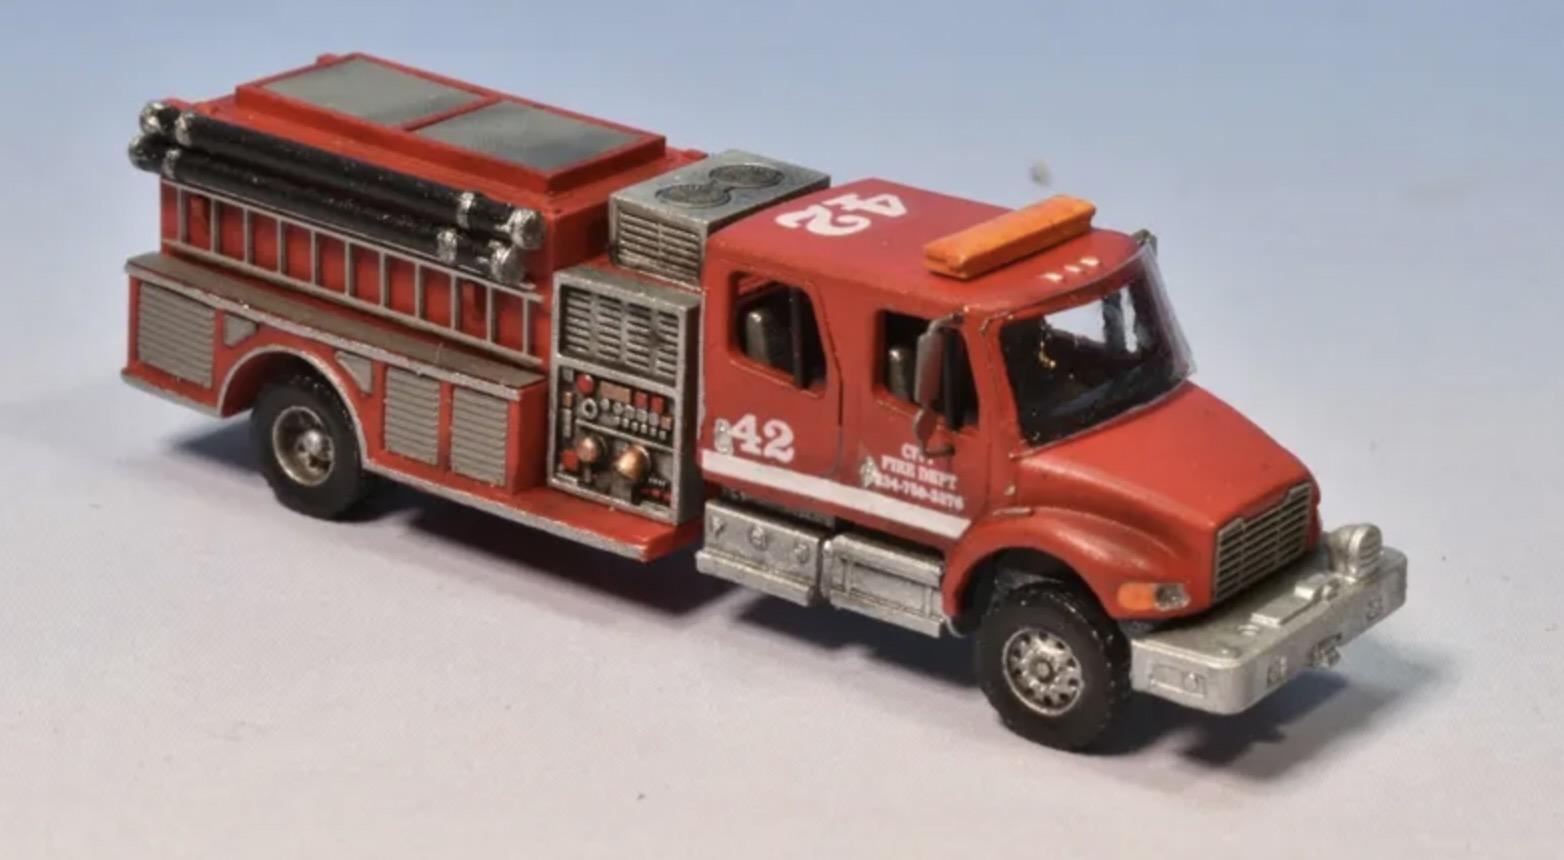 N Scale - Showcase Miniatures - 140 - Vehicle, Truck, Fire Engine, F-M2 Pumper - Fire and Rescue